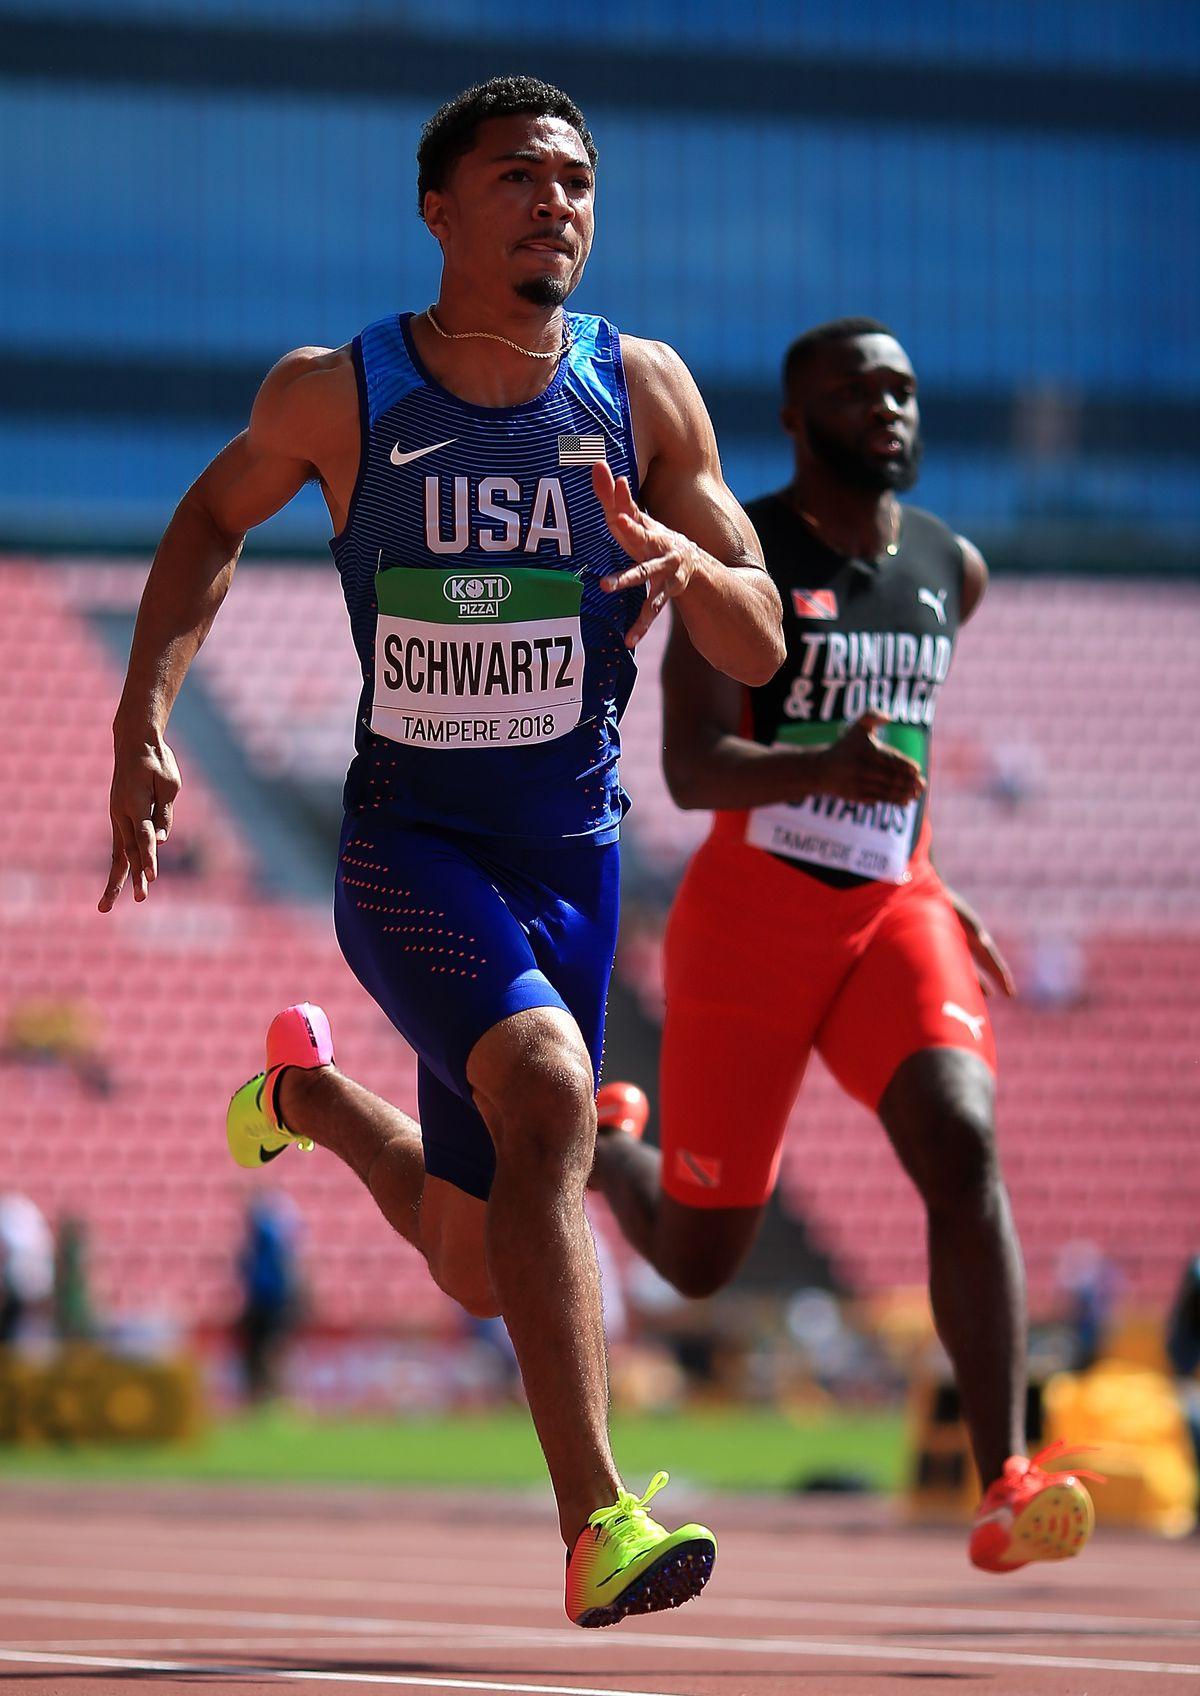 IAAF World U20 Championships - Day 1